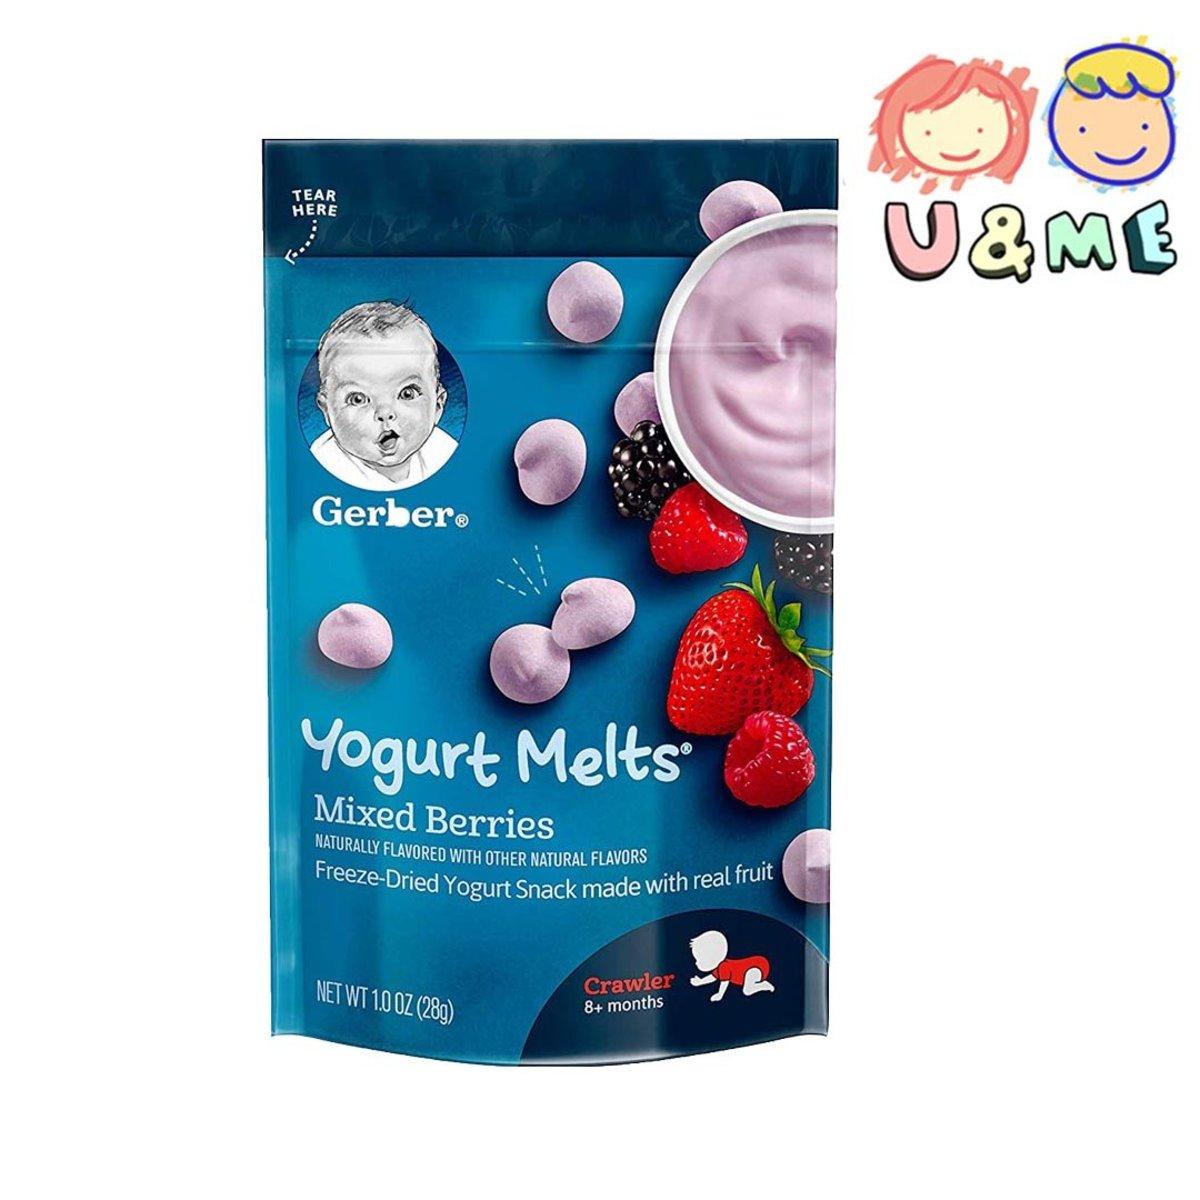 Yogurt Melts - Mixed Berries 28g (Parallel Import)